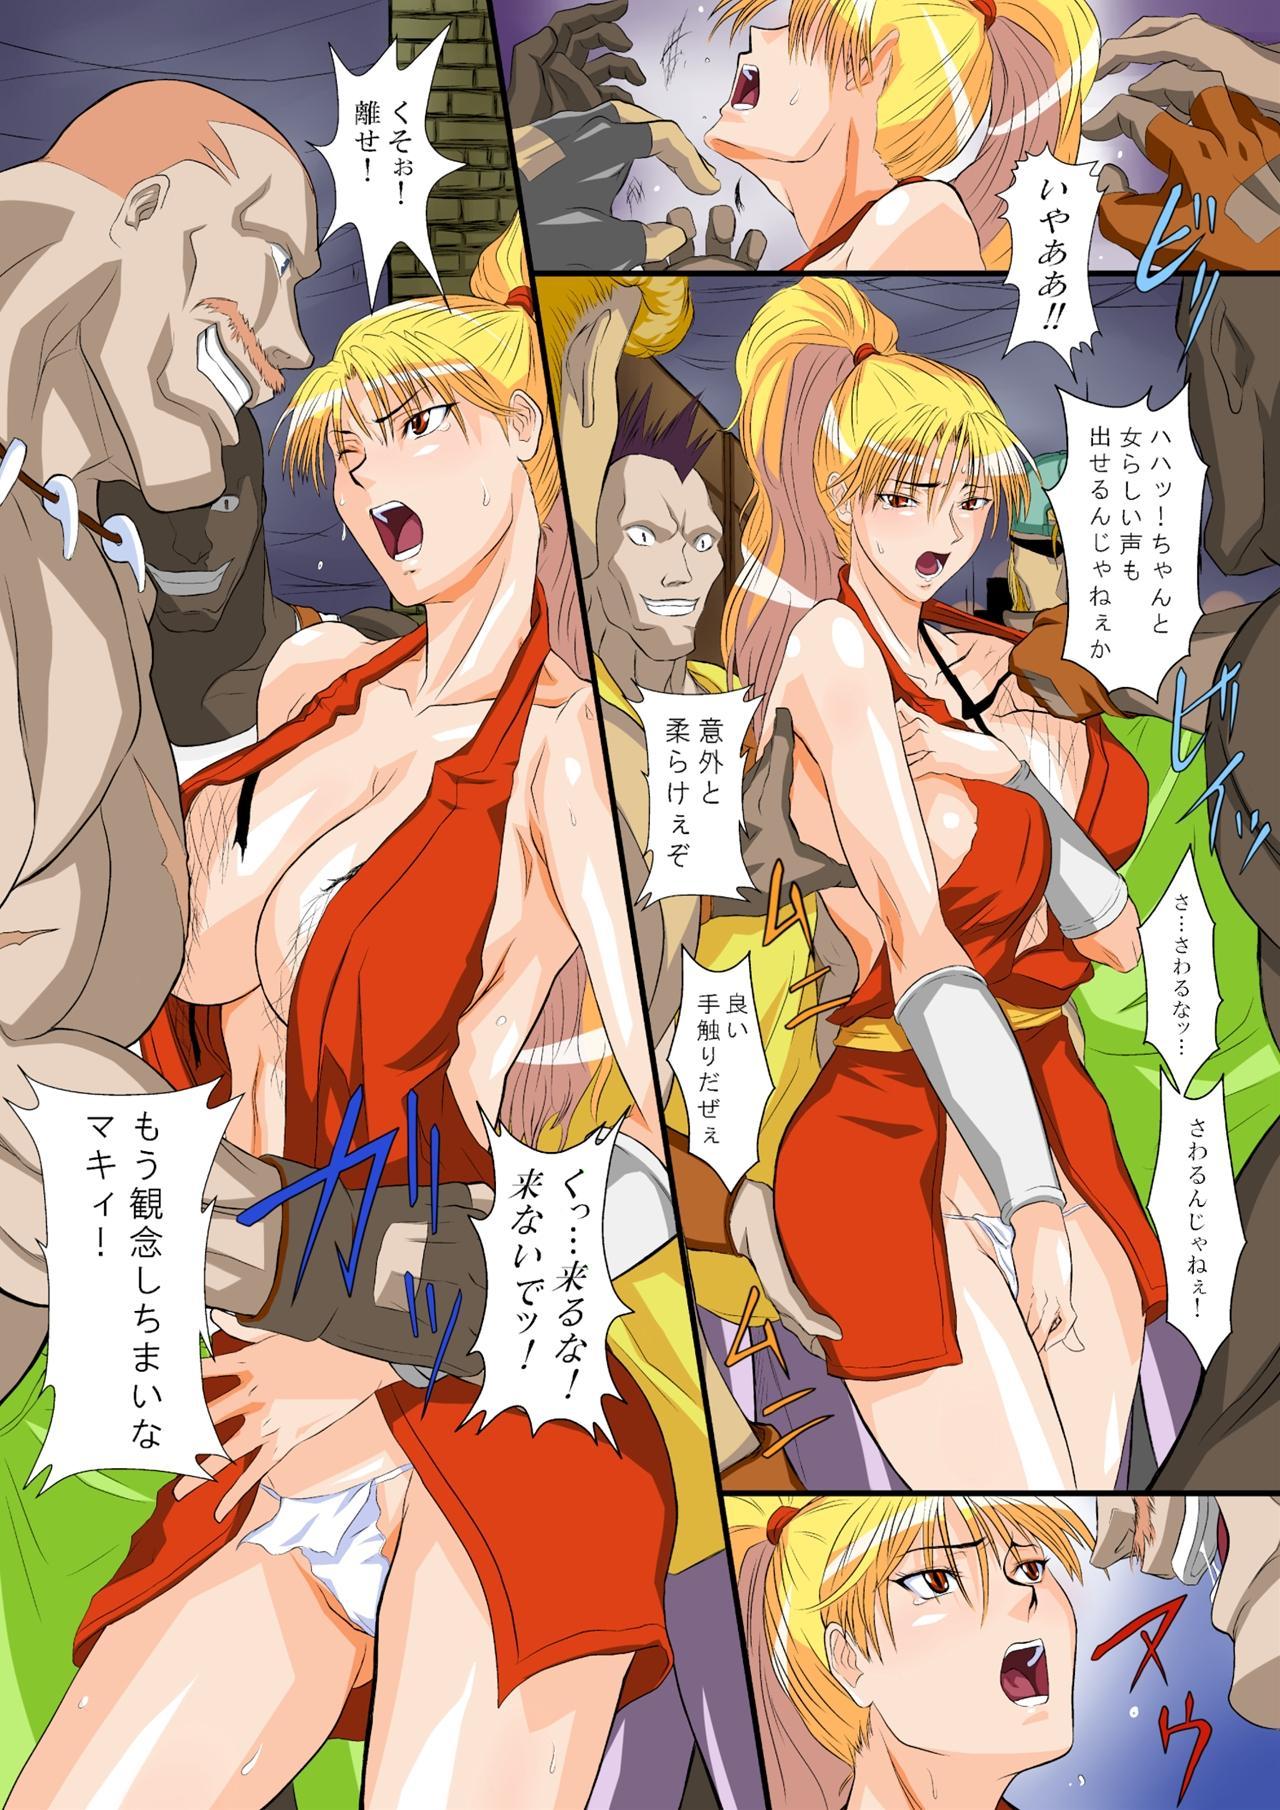 Maki's Stage 4 12